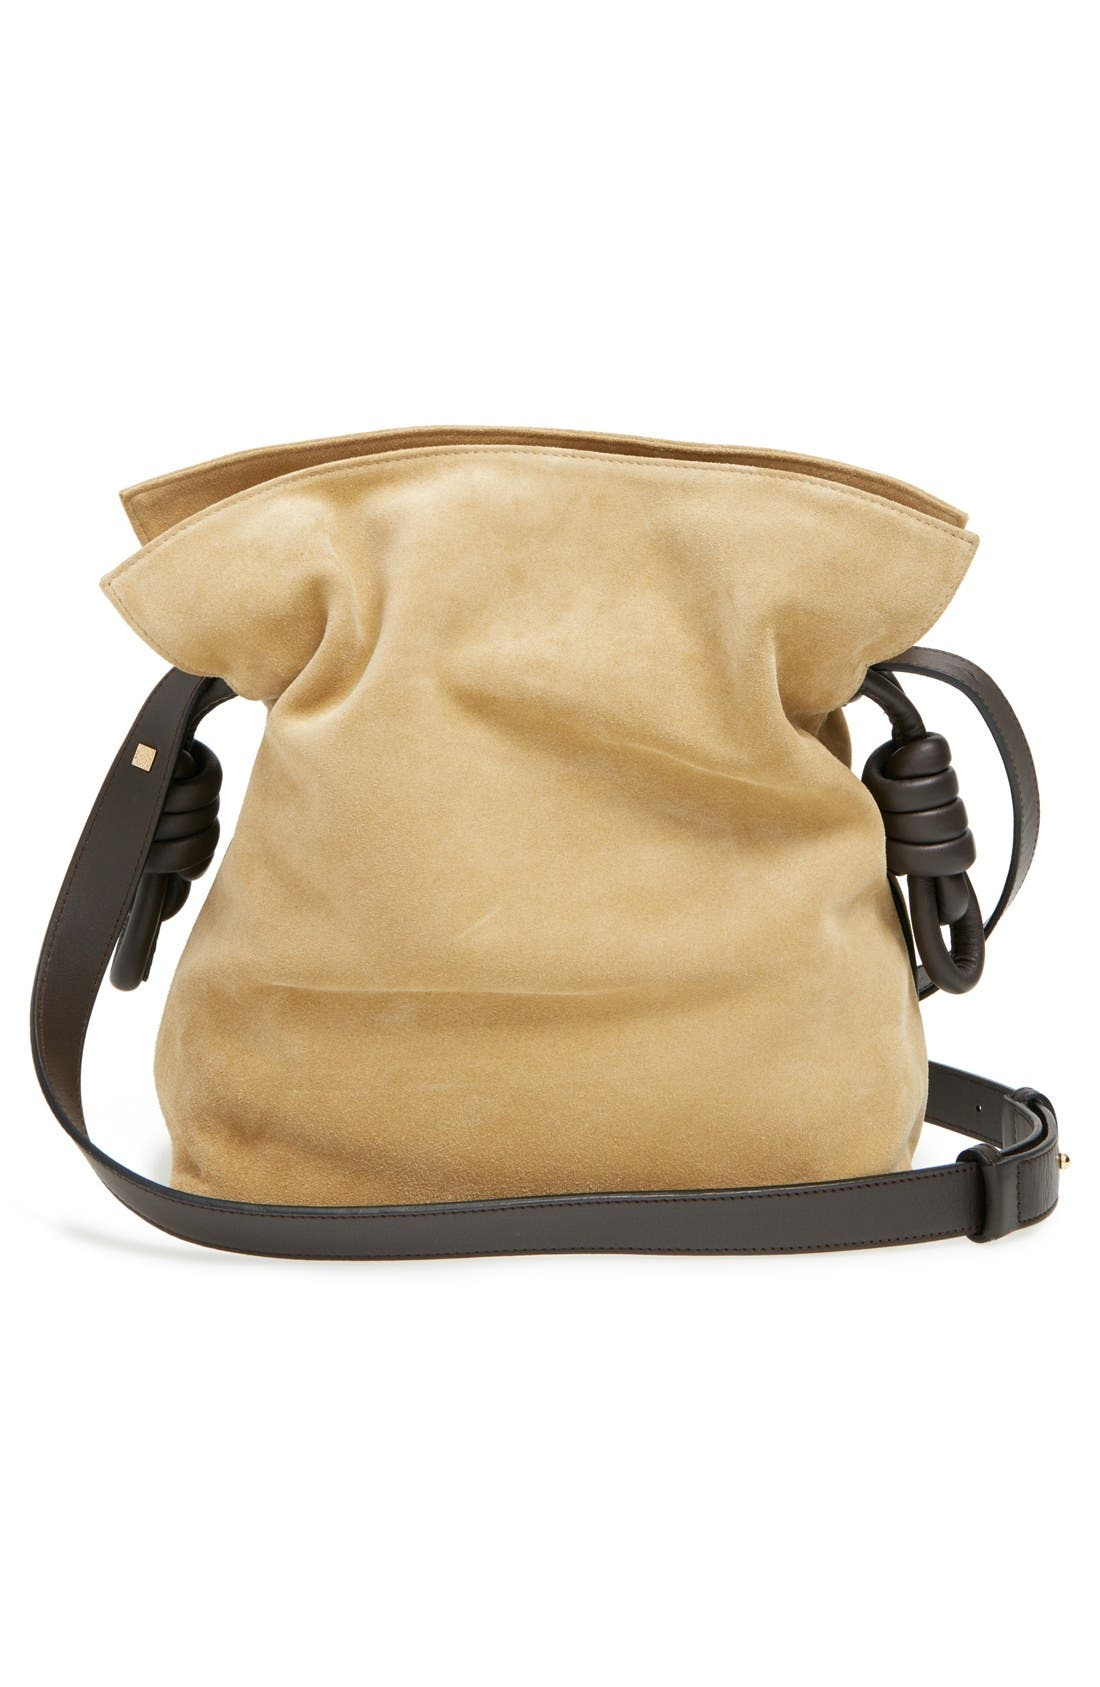 'Flamenco Knot' Suede & Calfskin Leather Bag,                             Alternate thumbnail 5, color,                             250